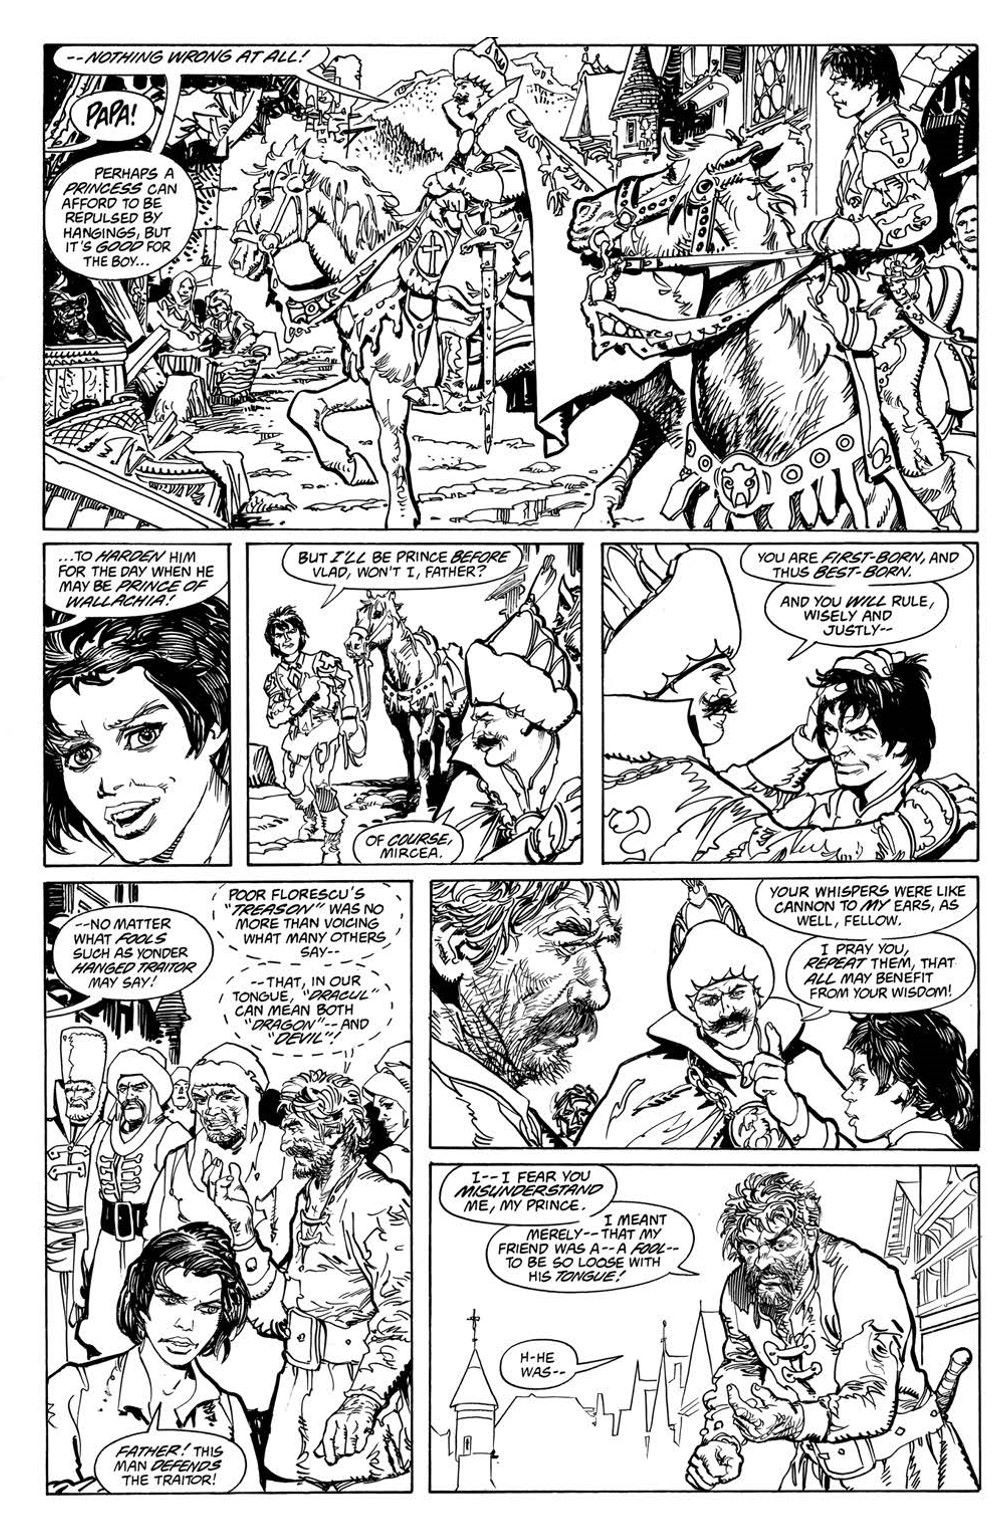 VladTheImpaler_TPB_pr-7 ComicList Previews: DRACULA VLAD THE IMPALER GN